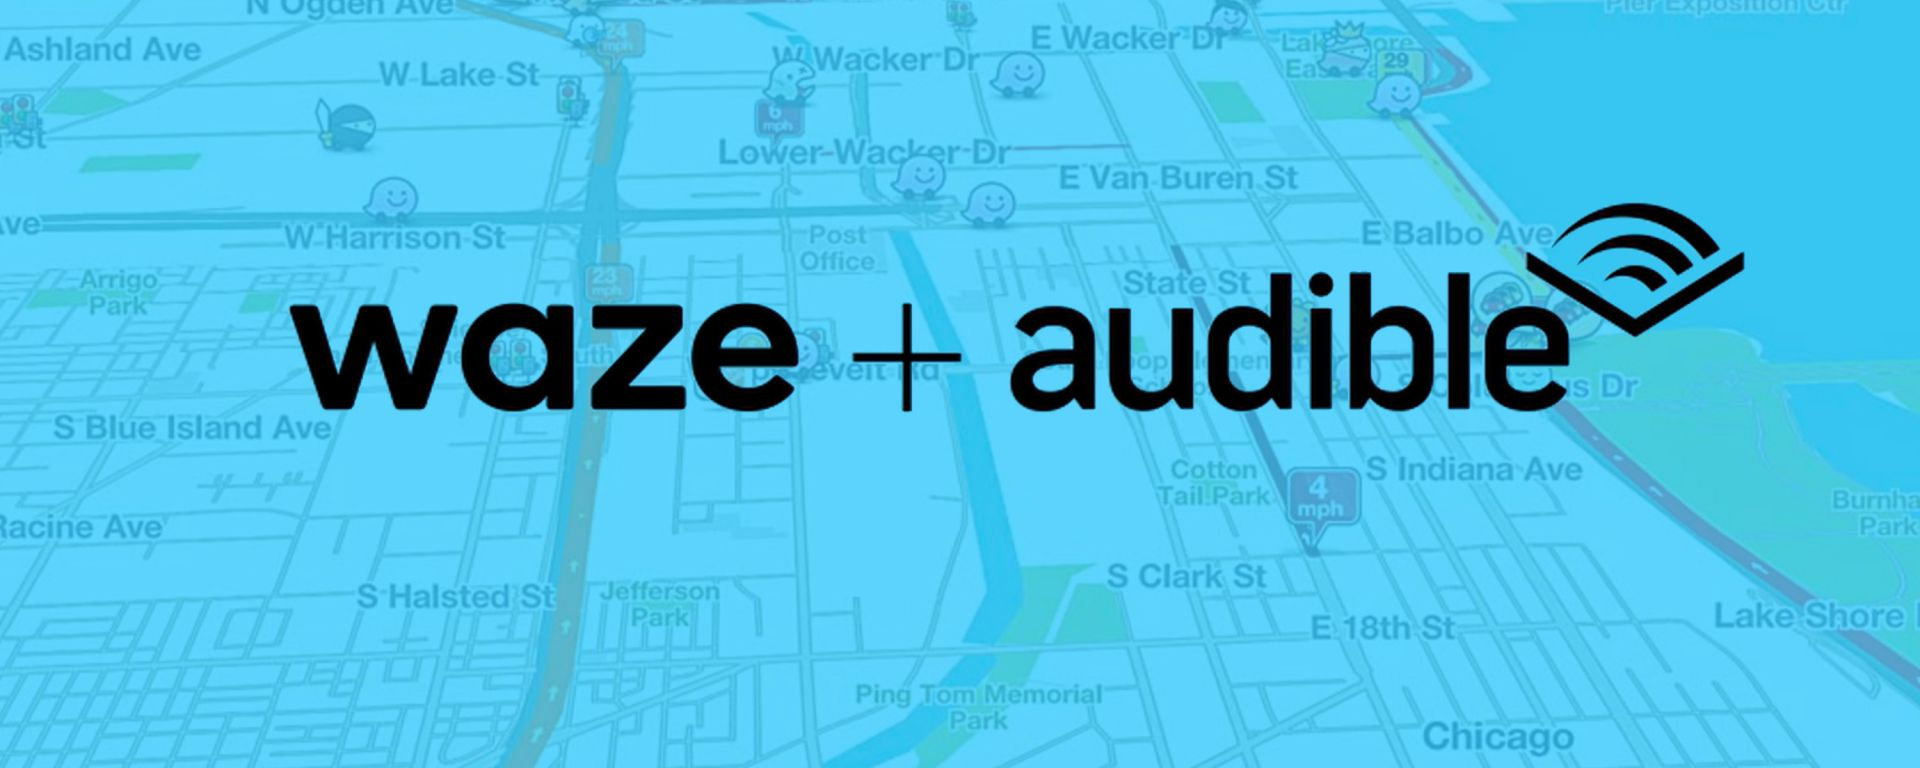 Waze + Audible: la partnership